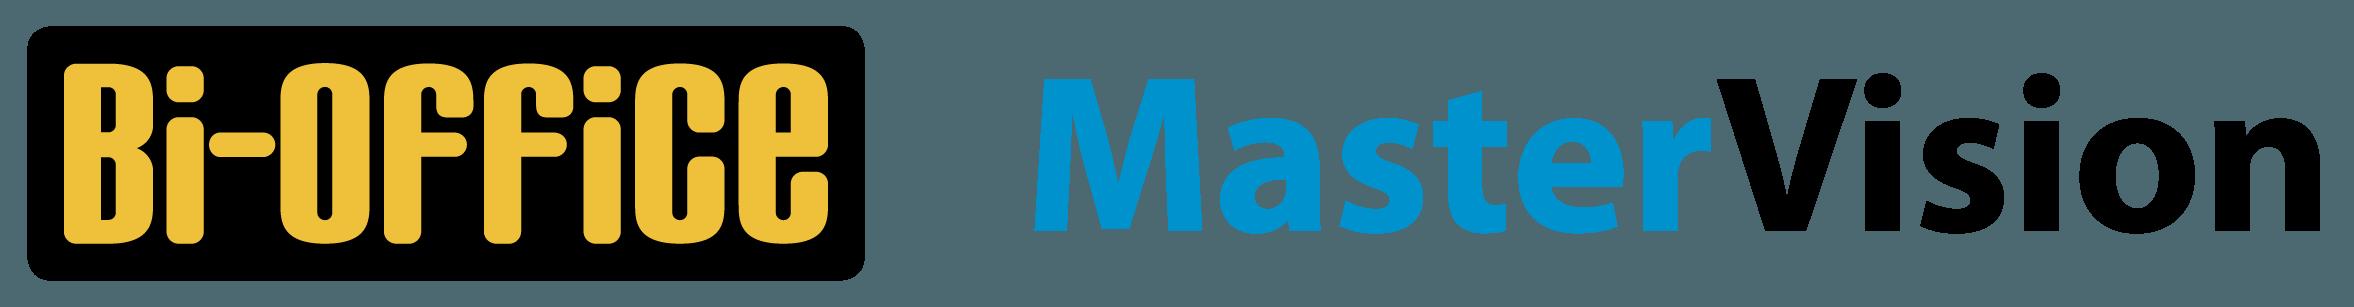 bi-office-mastervision